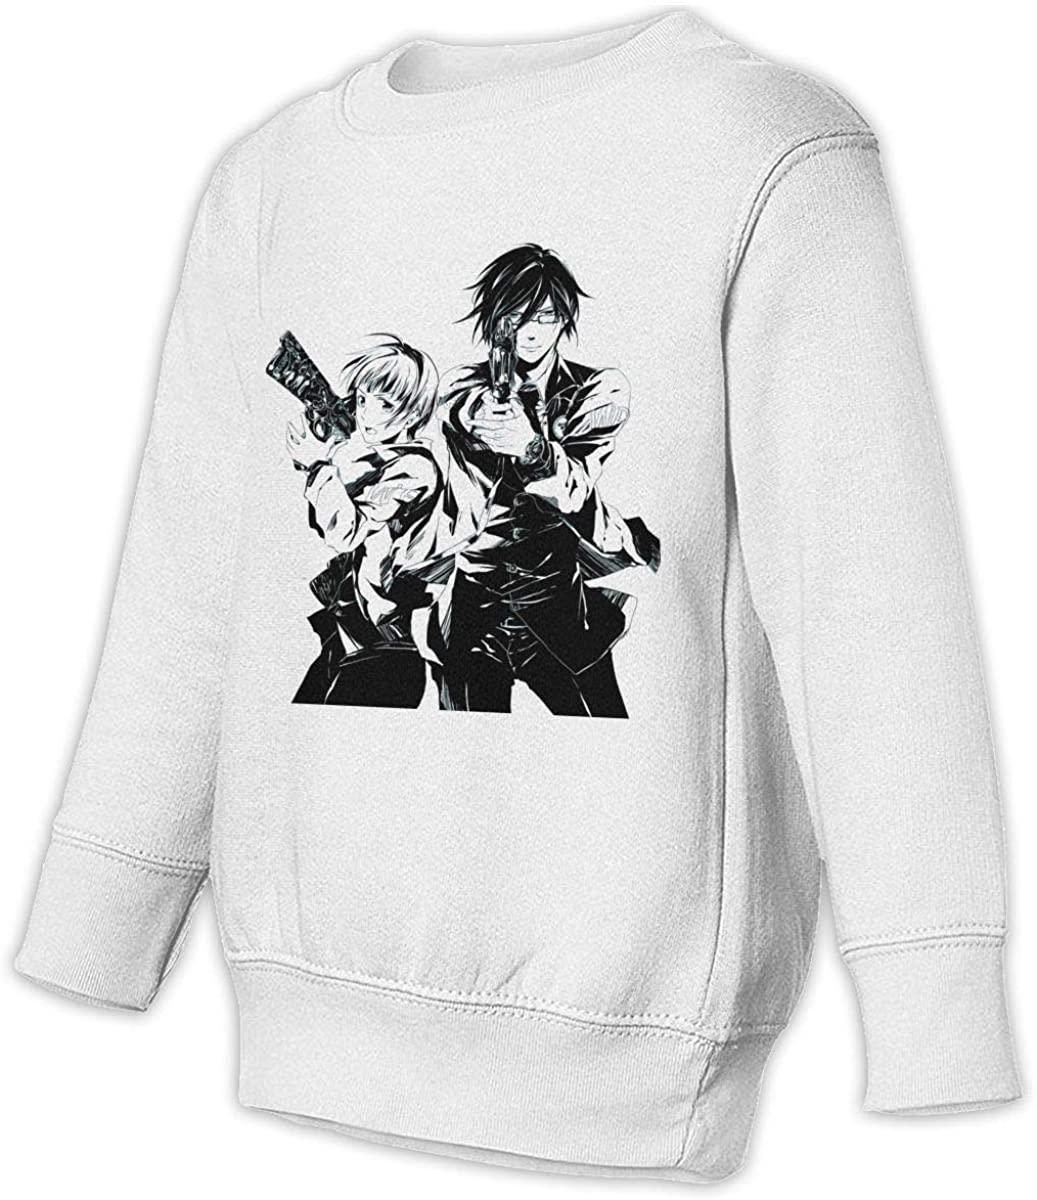 ASDFNLSF Psycho Pass Unisex Sweatshirt Youth Boy and Girls Pullover Sweatshirt